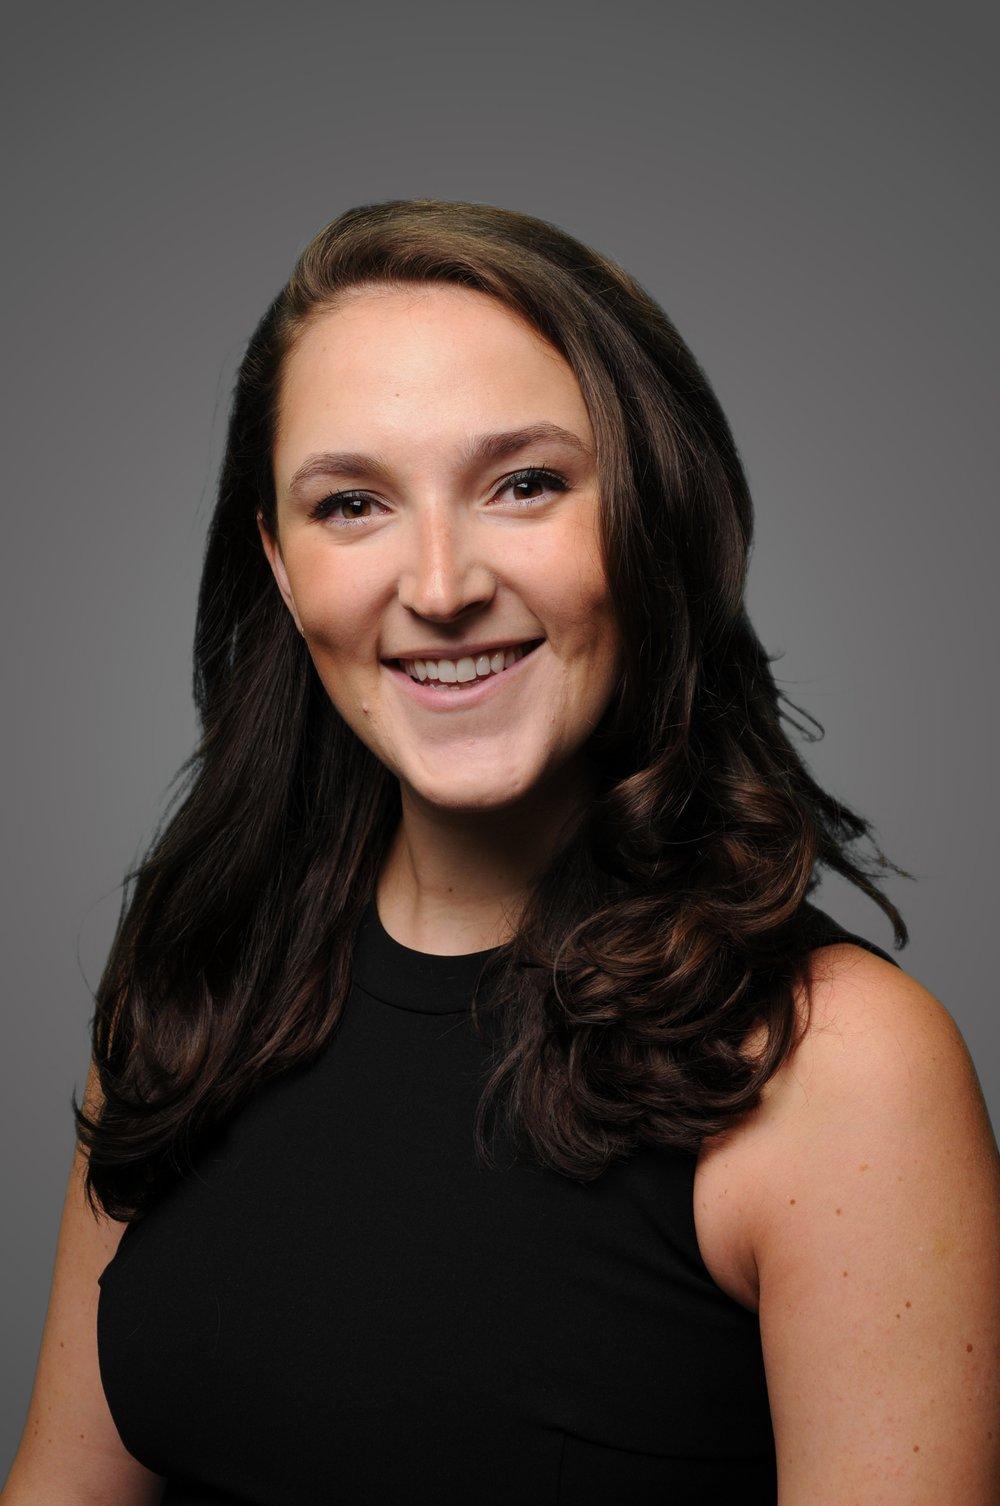 Alyssa Smith   AVP of Corporate Relations- Finance  ajs1322@stern.nyu.edu